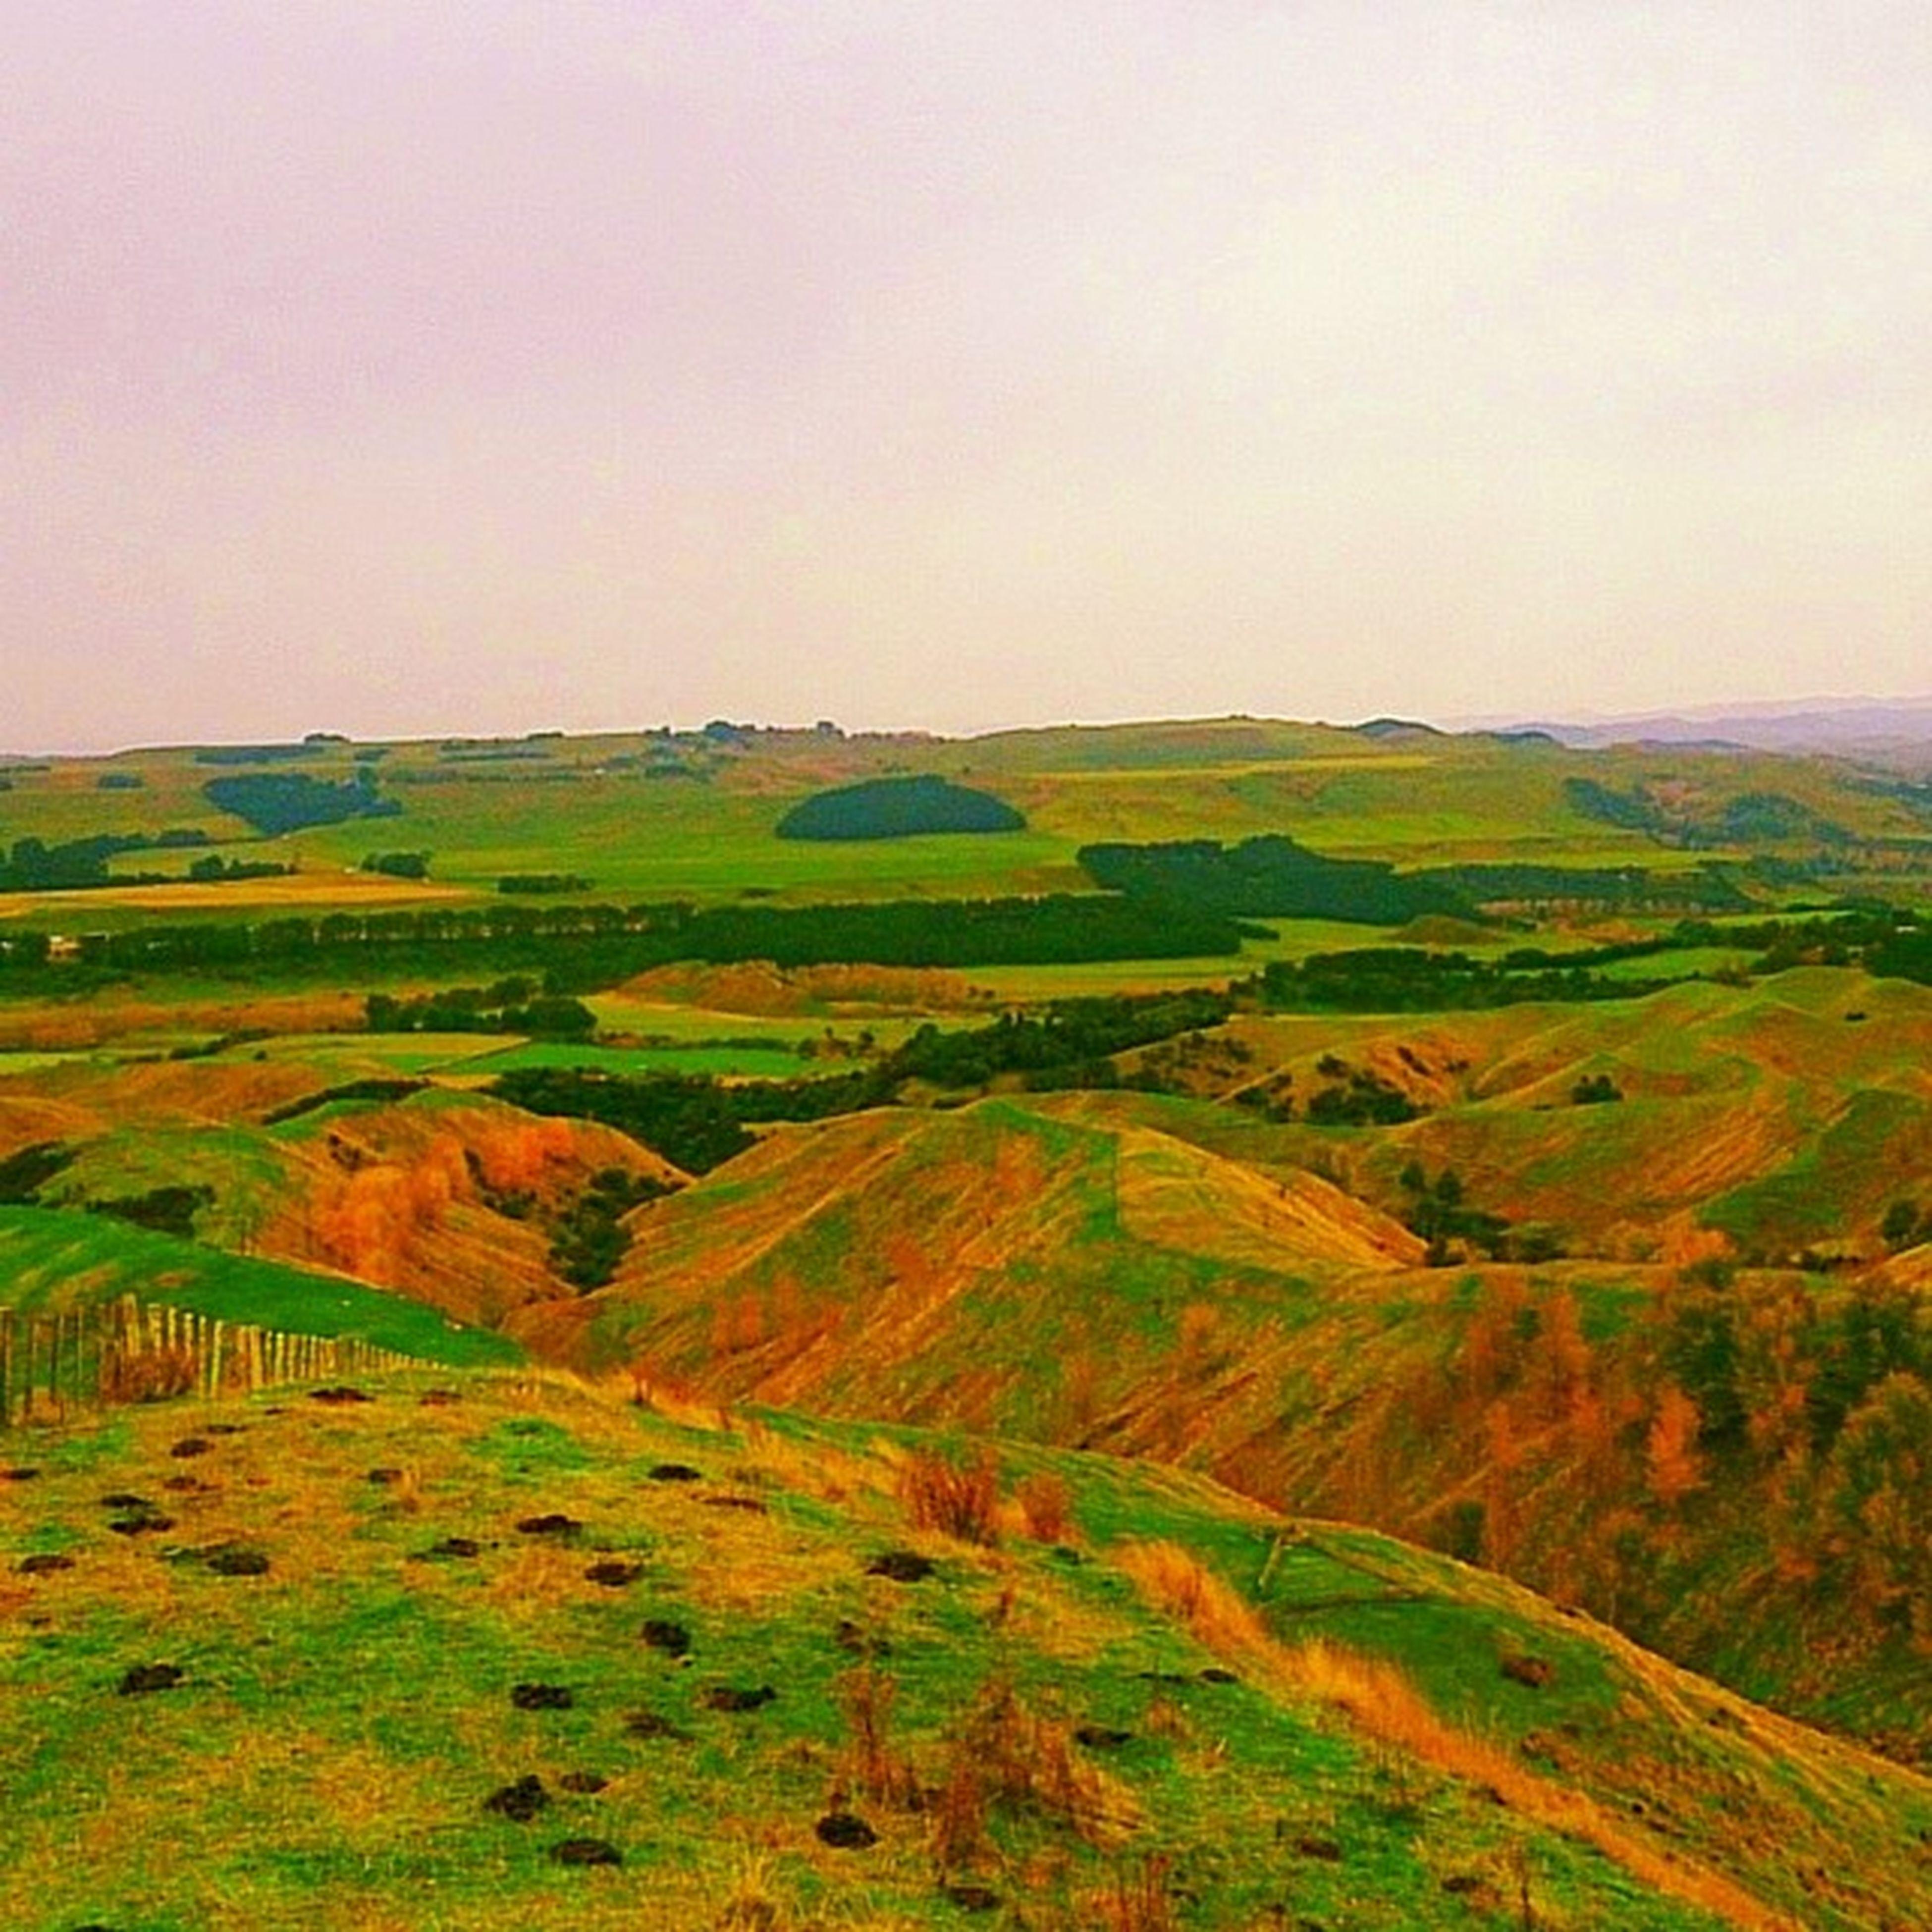 Vinegarhill Hill NZ